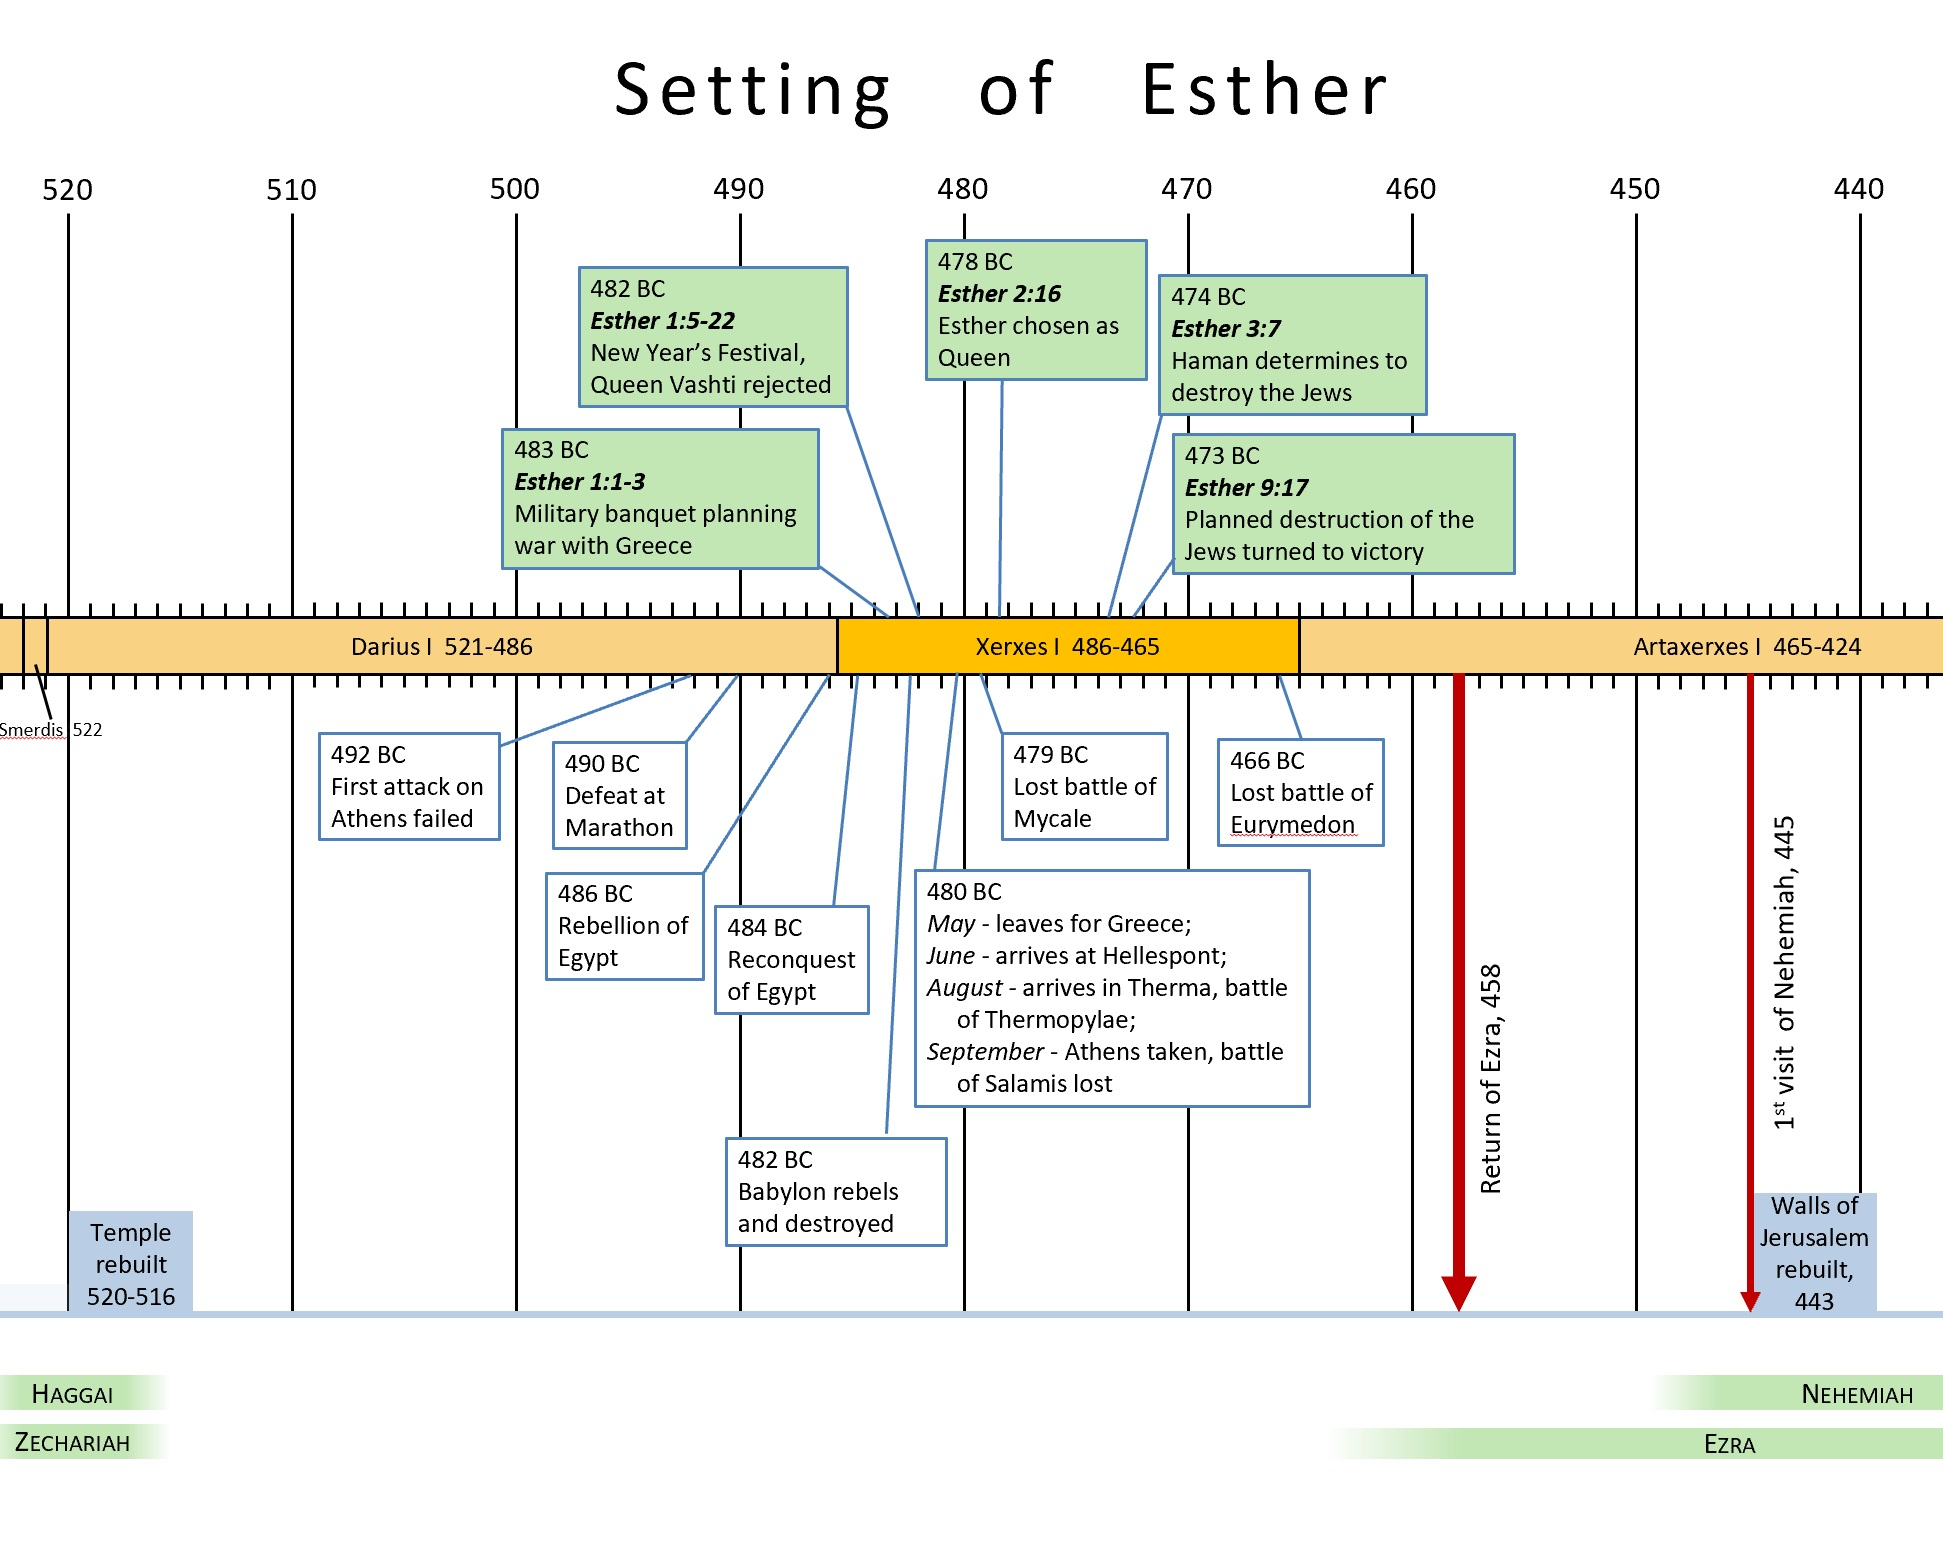 Esther & Chronology